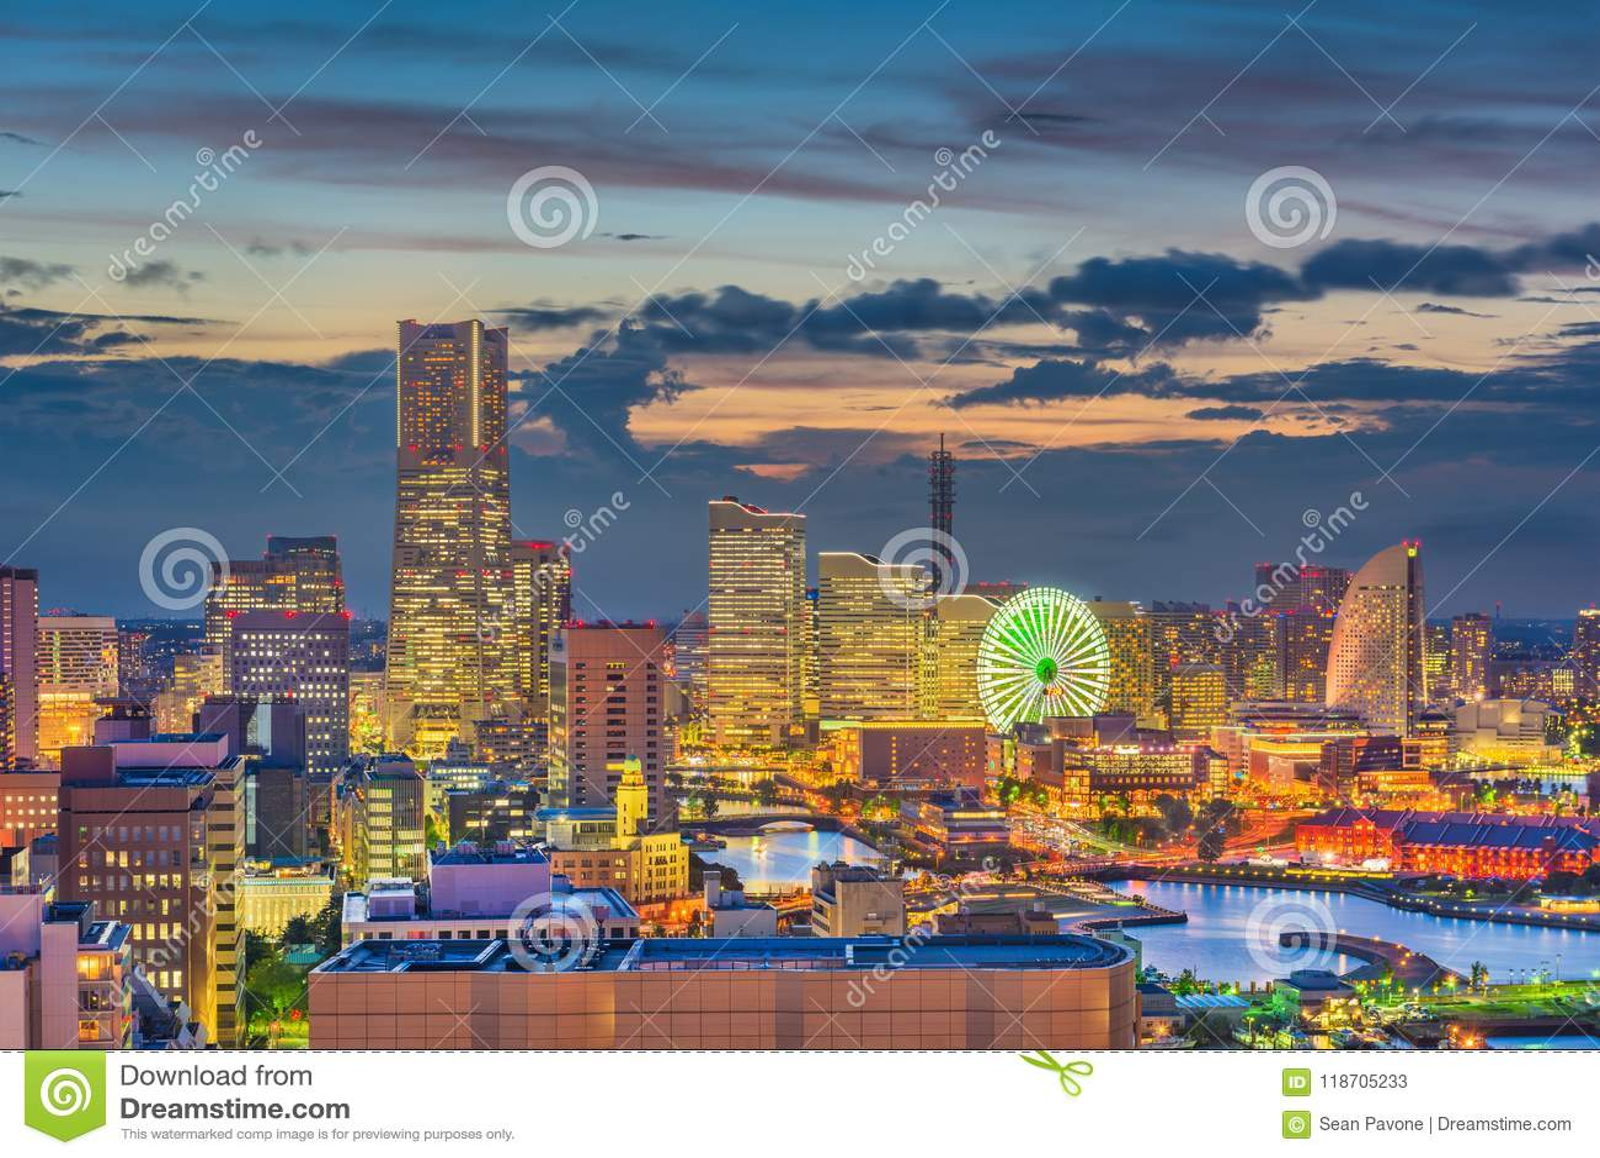 Yokohama, Japan City Skyline